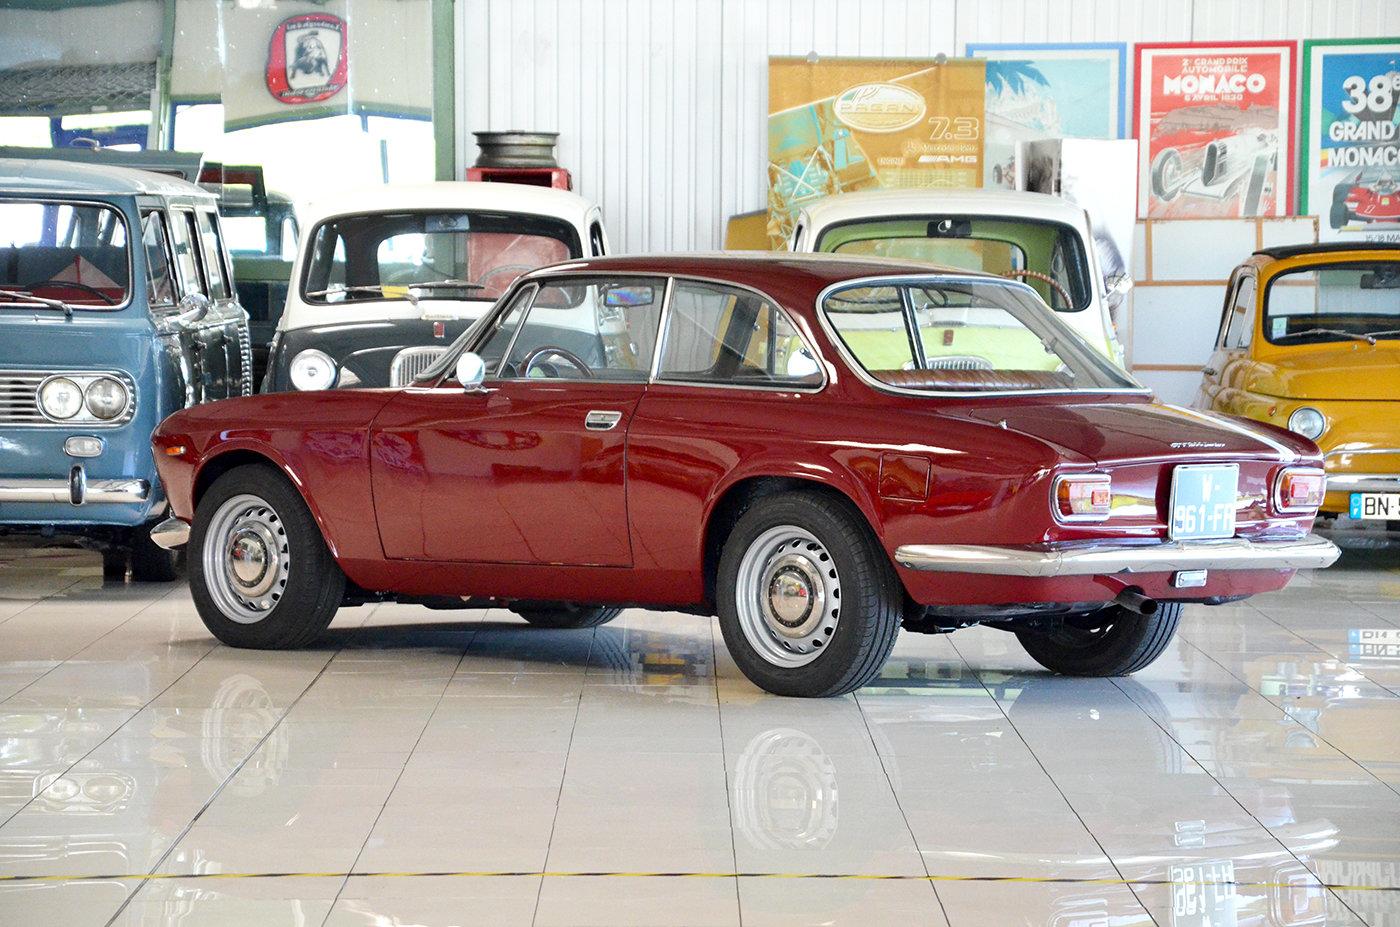 1970 Alfa Romeo GT Junior 1300 Stepnose - Excellent For Sale (picture 3 of 6)